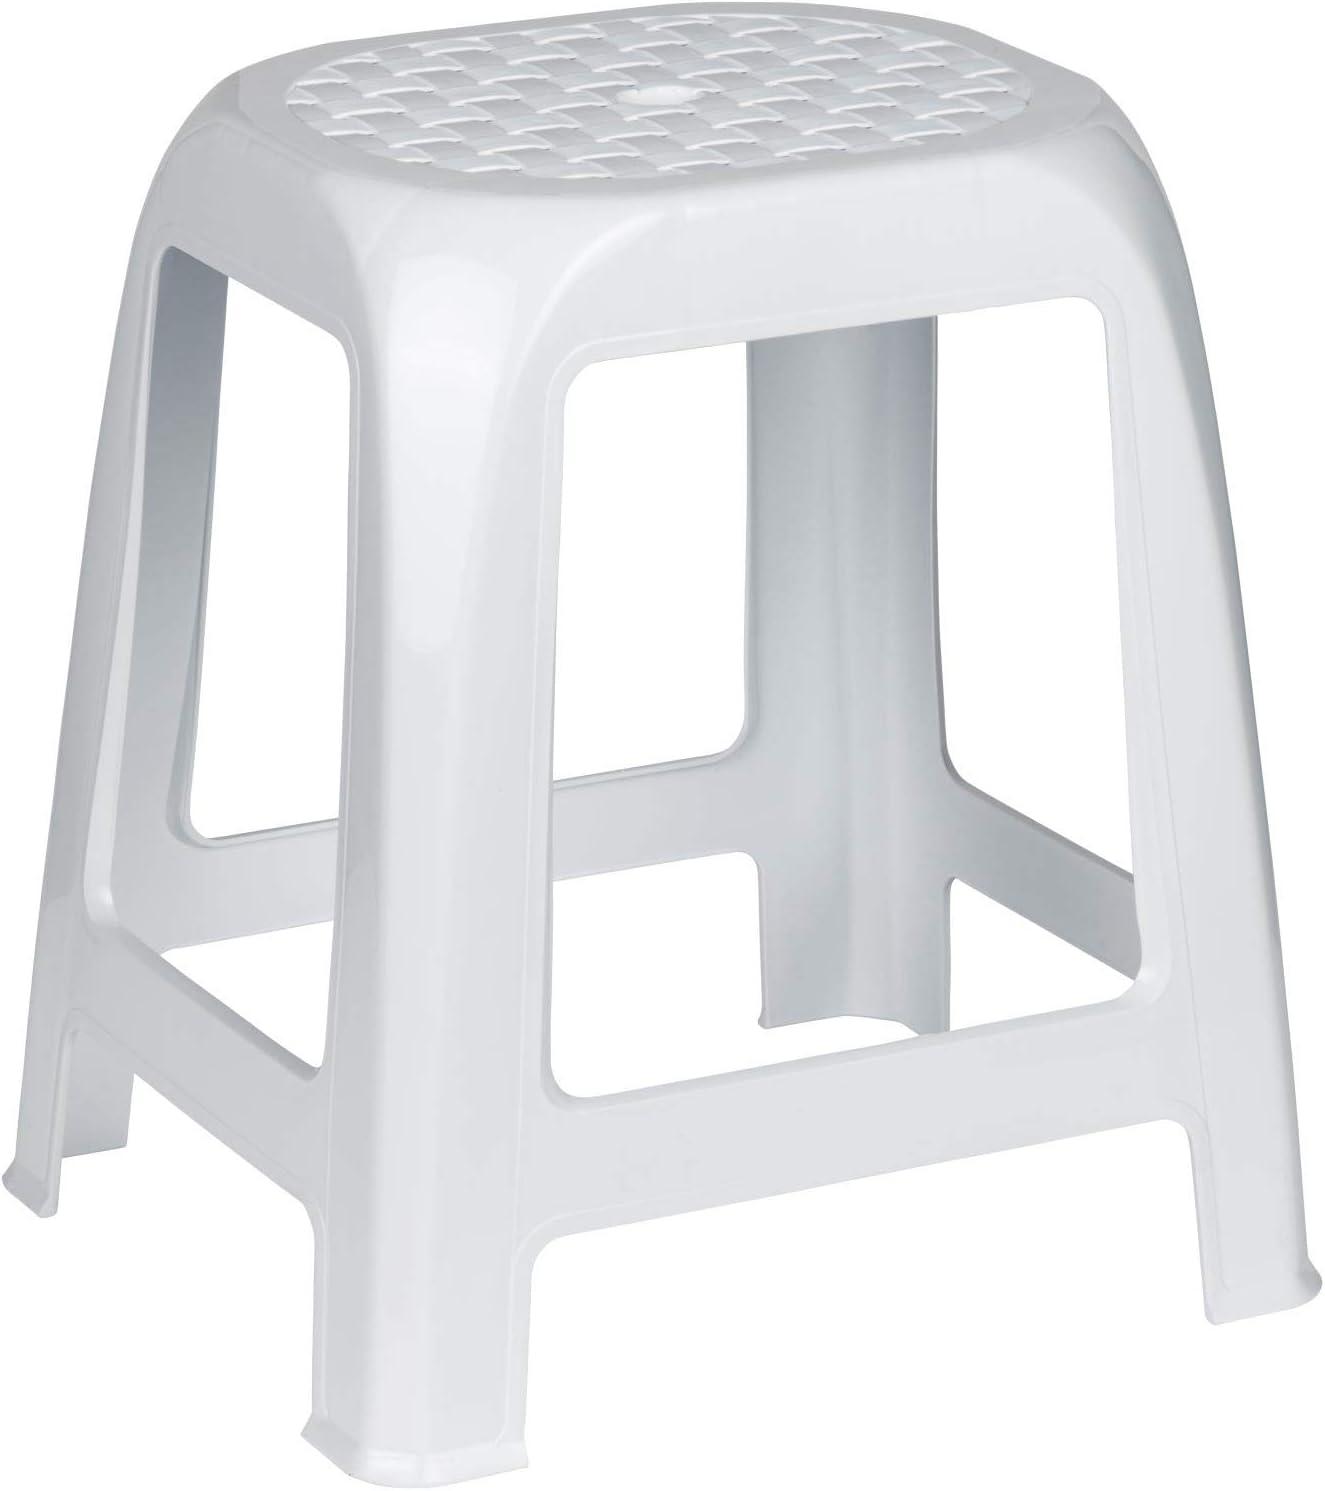 IKEA BOLMEN Badezimmerhocker in blau Hocker Tritthocker Sitzhocker